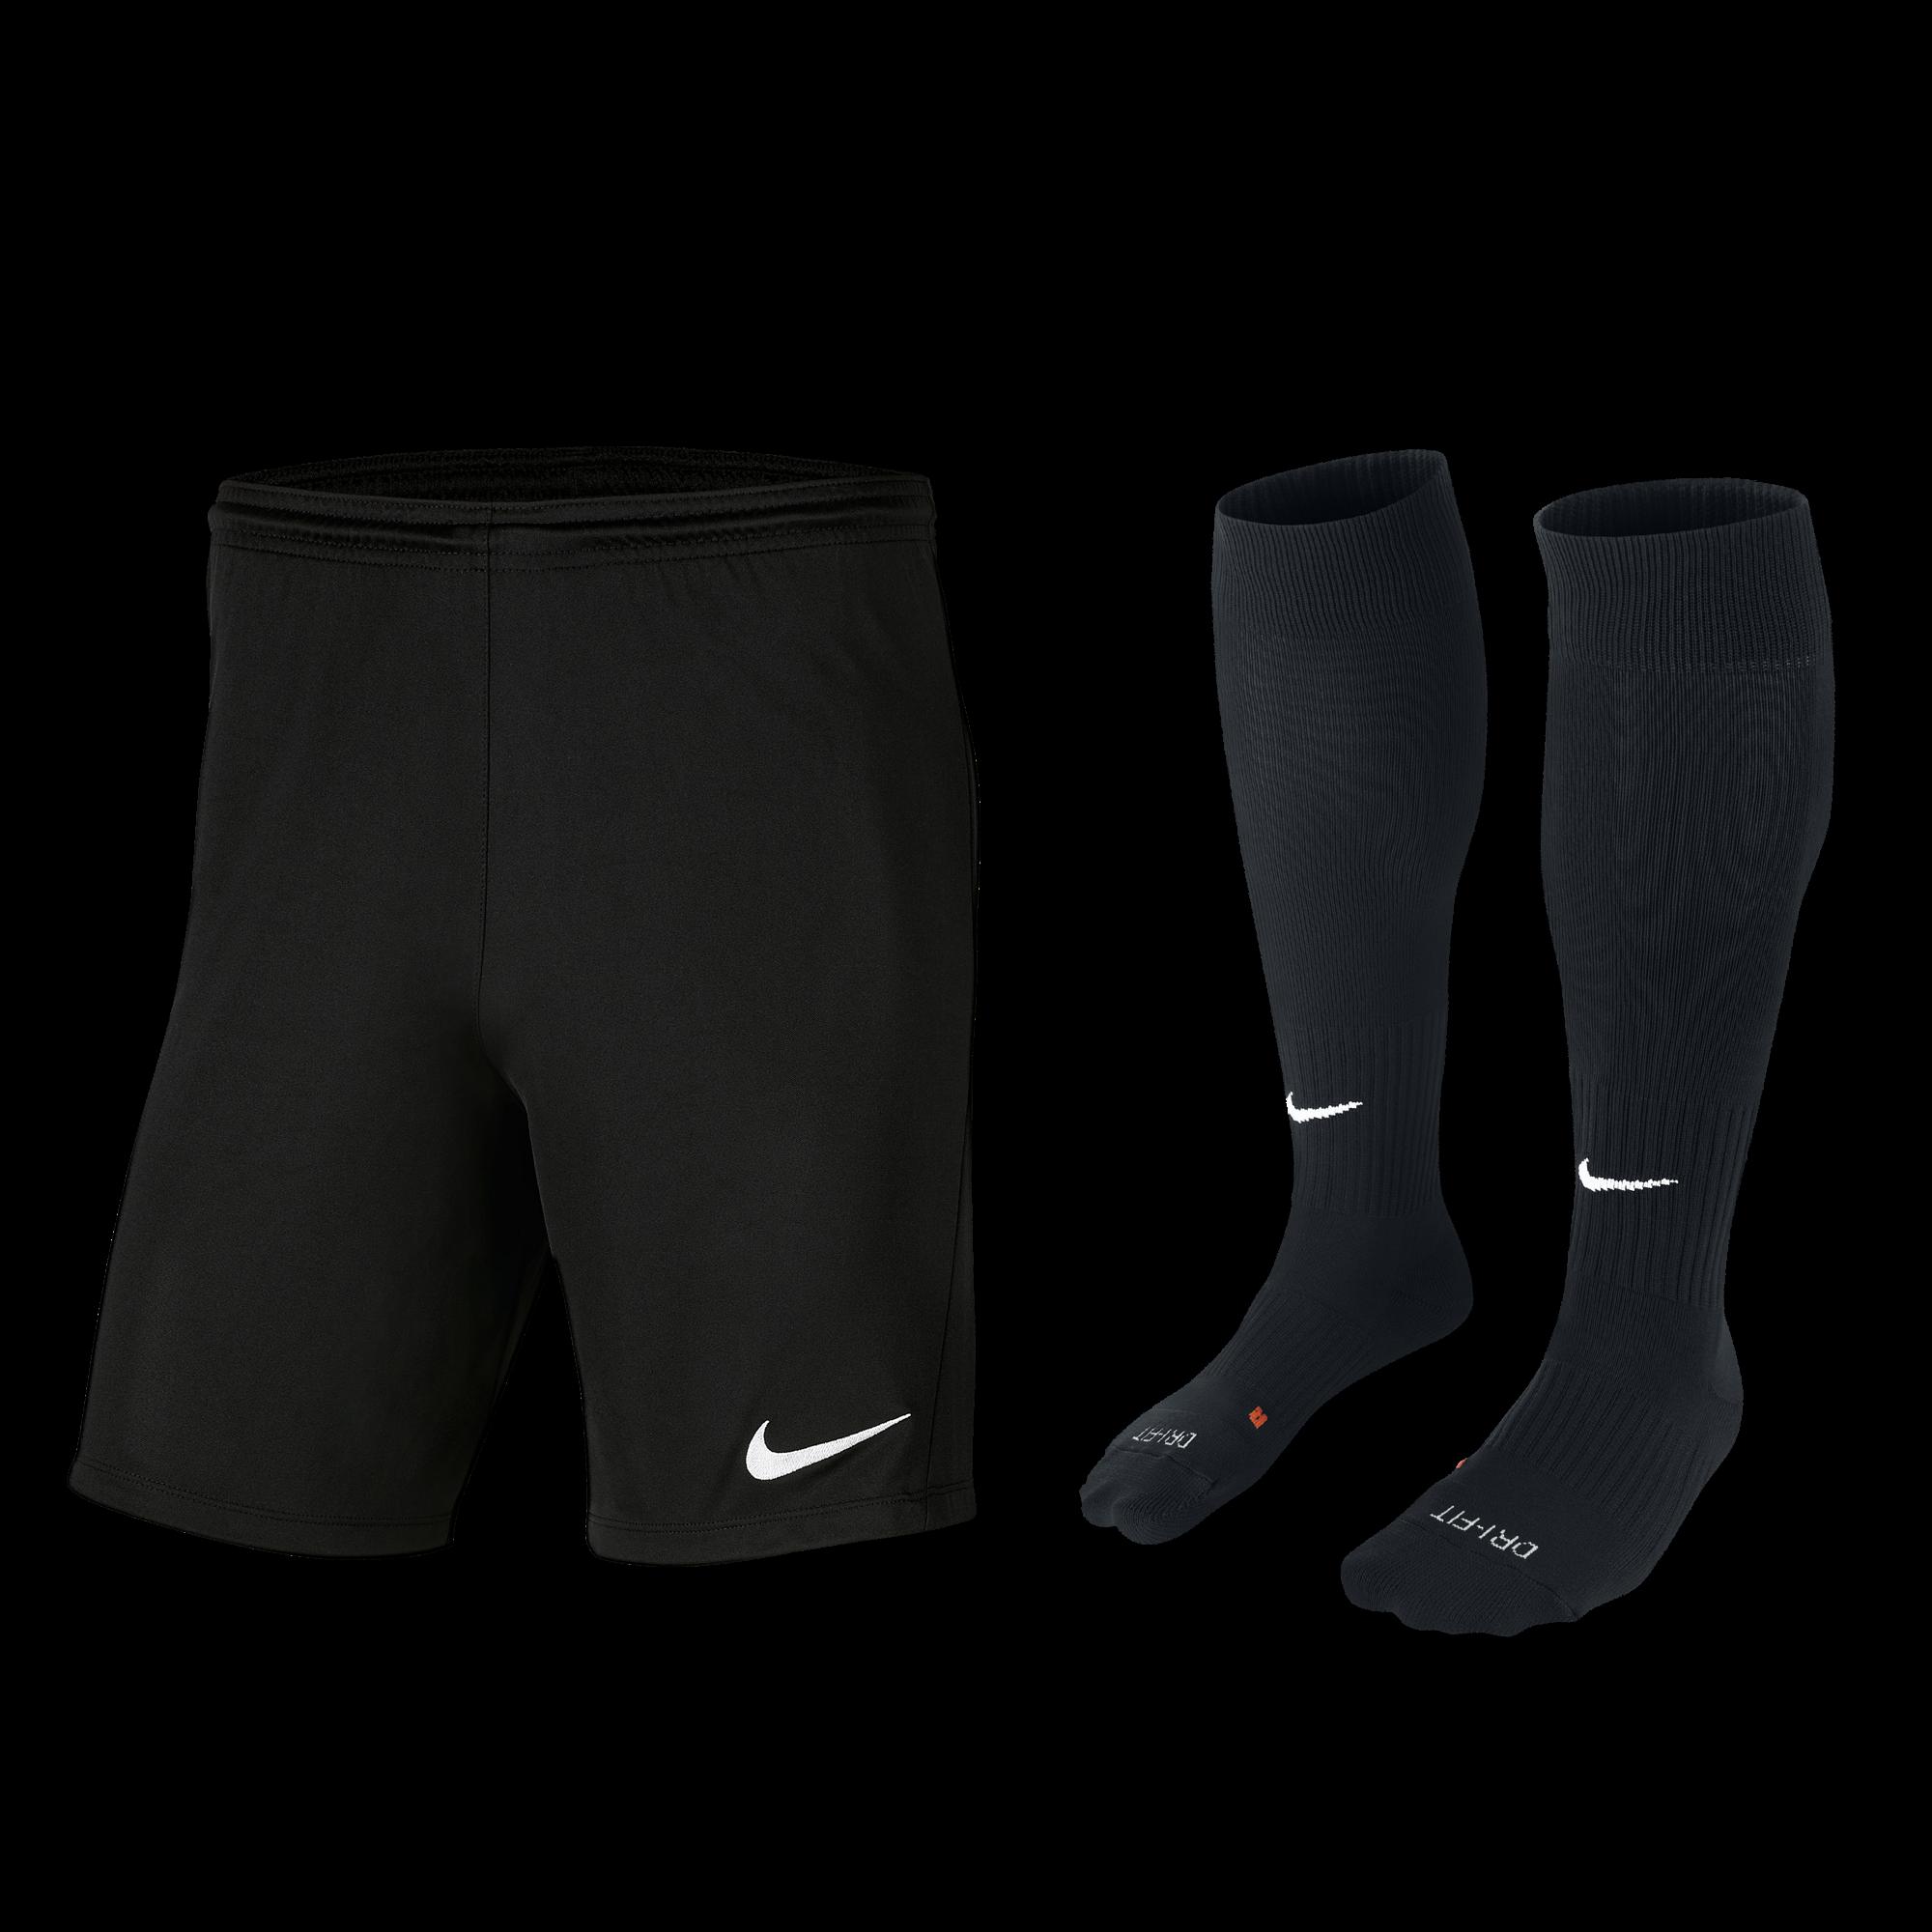 fc lisburn shorts socks 37308 p